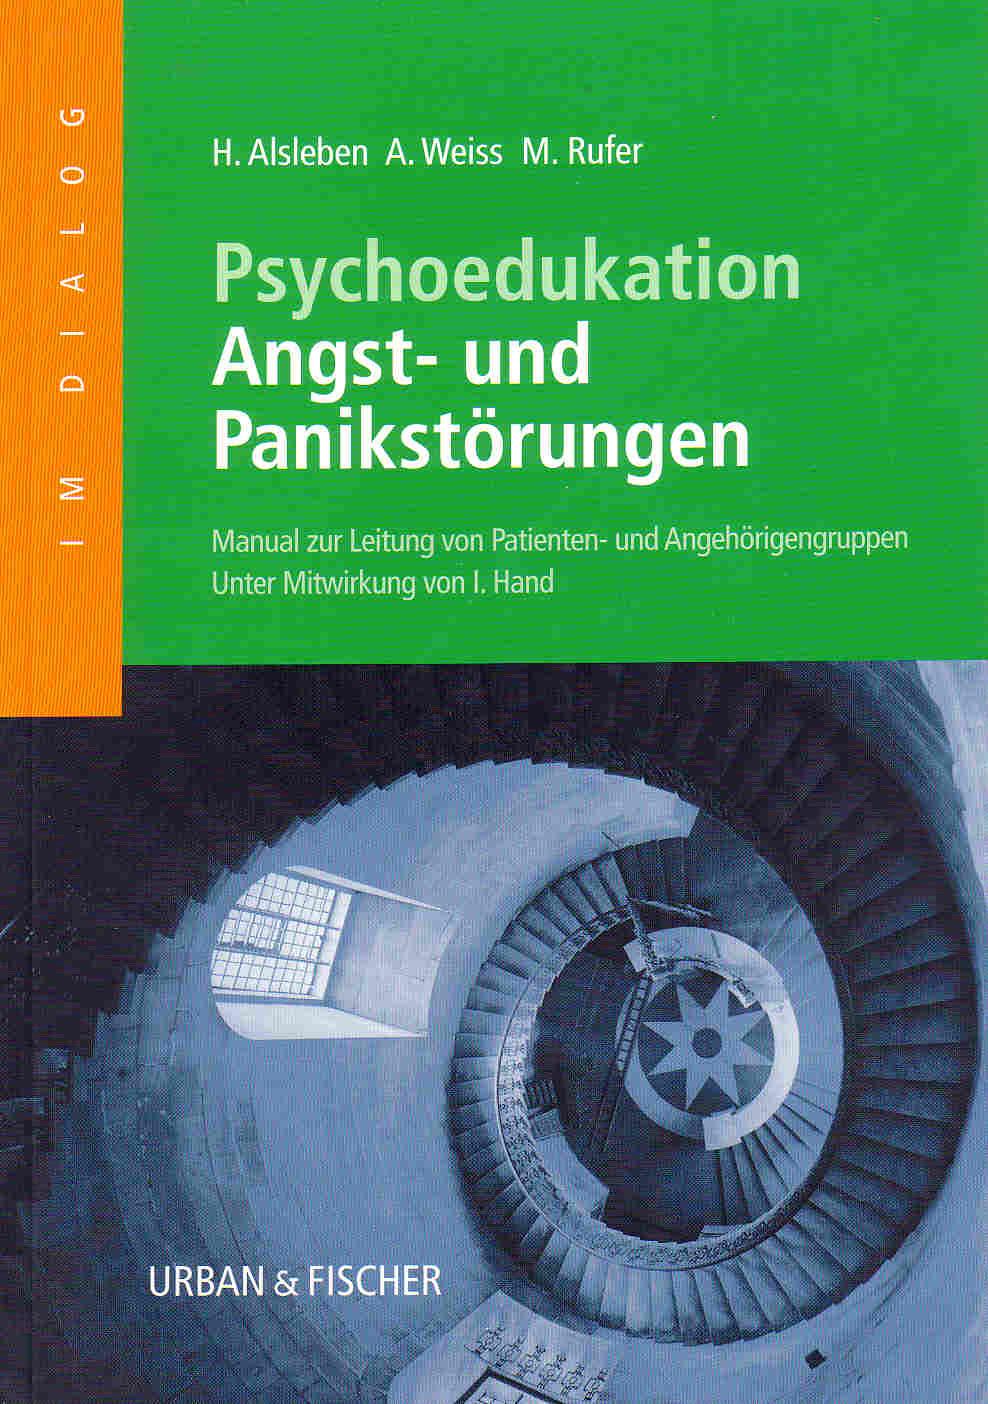 Bücher, Angst, Phobie, Prüfungsangst, Sozialphobie, Literatur ...